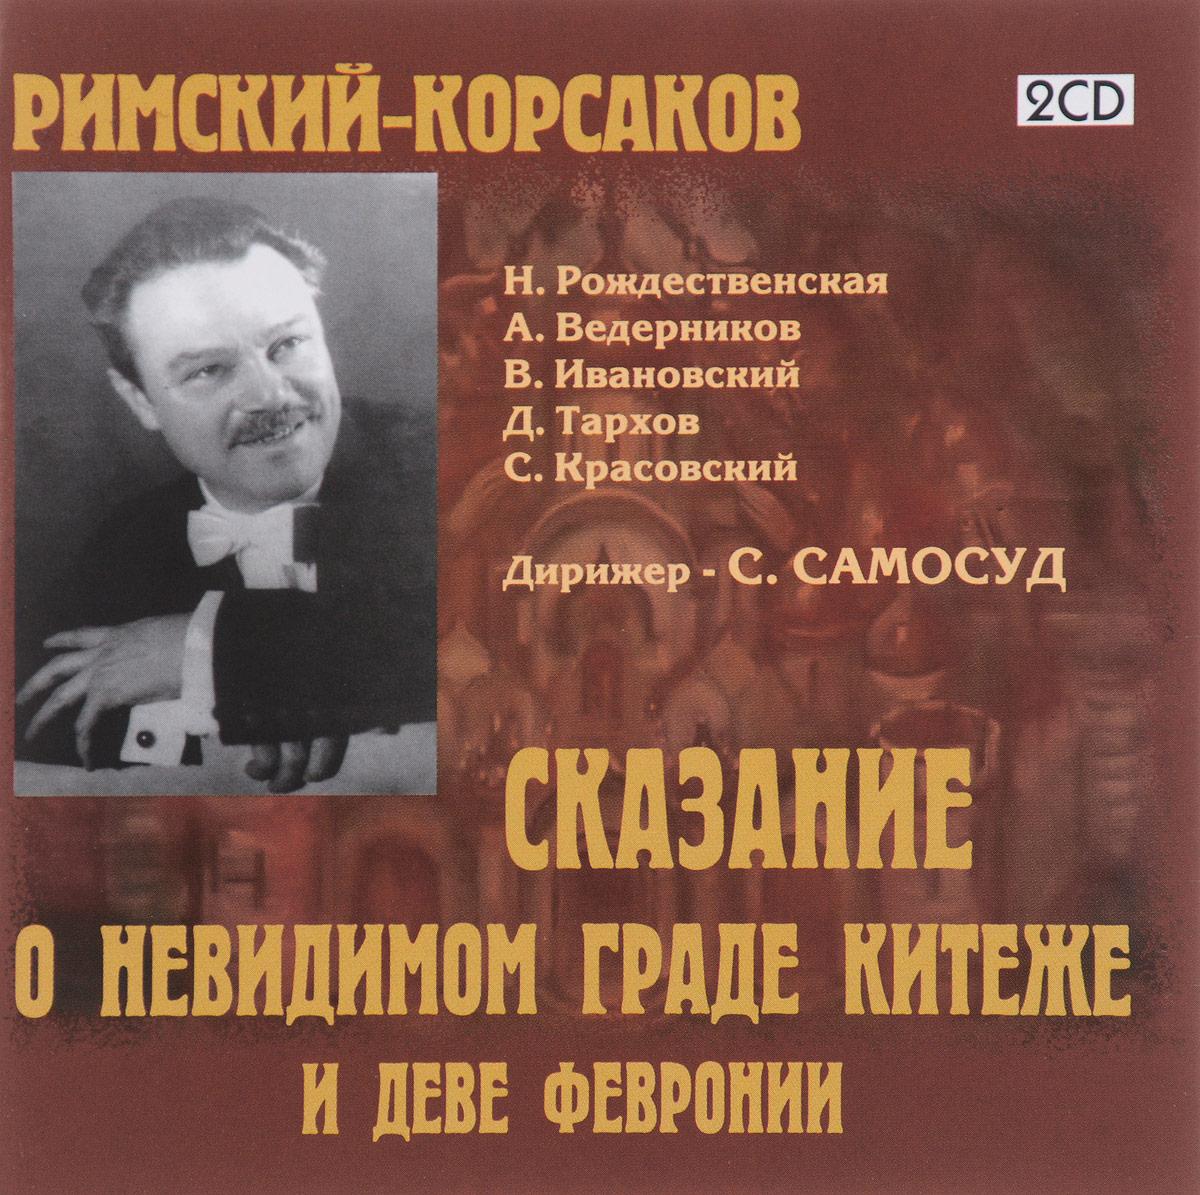 Римский-Корсаков. Сказание о невидимом граде Китеже и деве Февронии (2 CD)